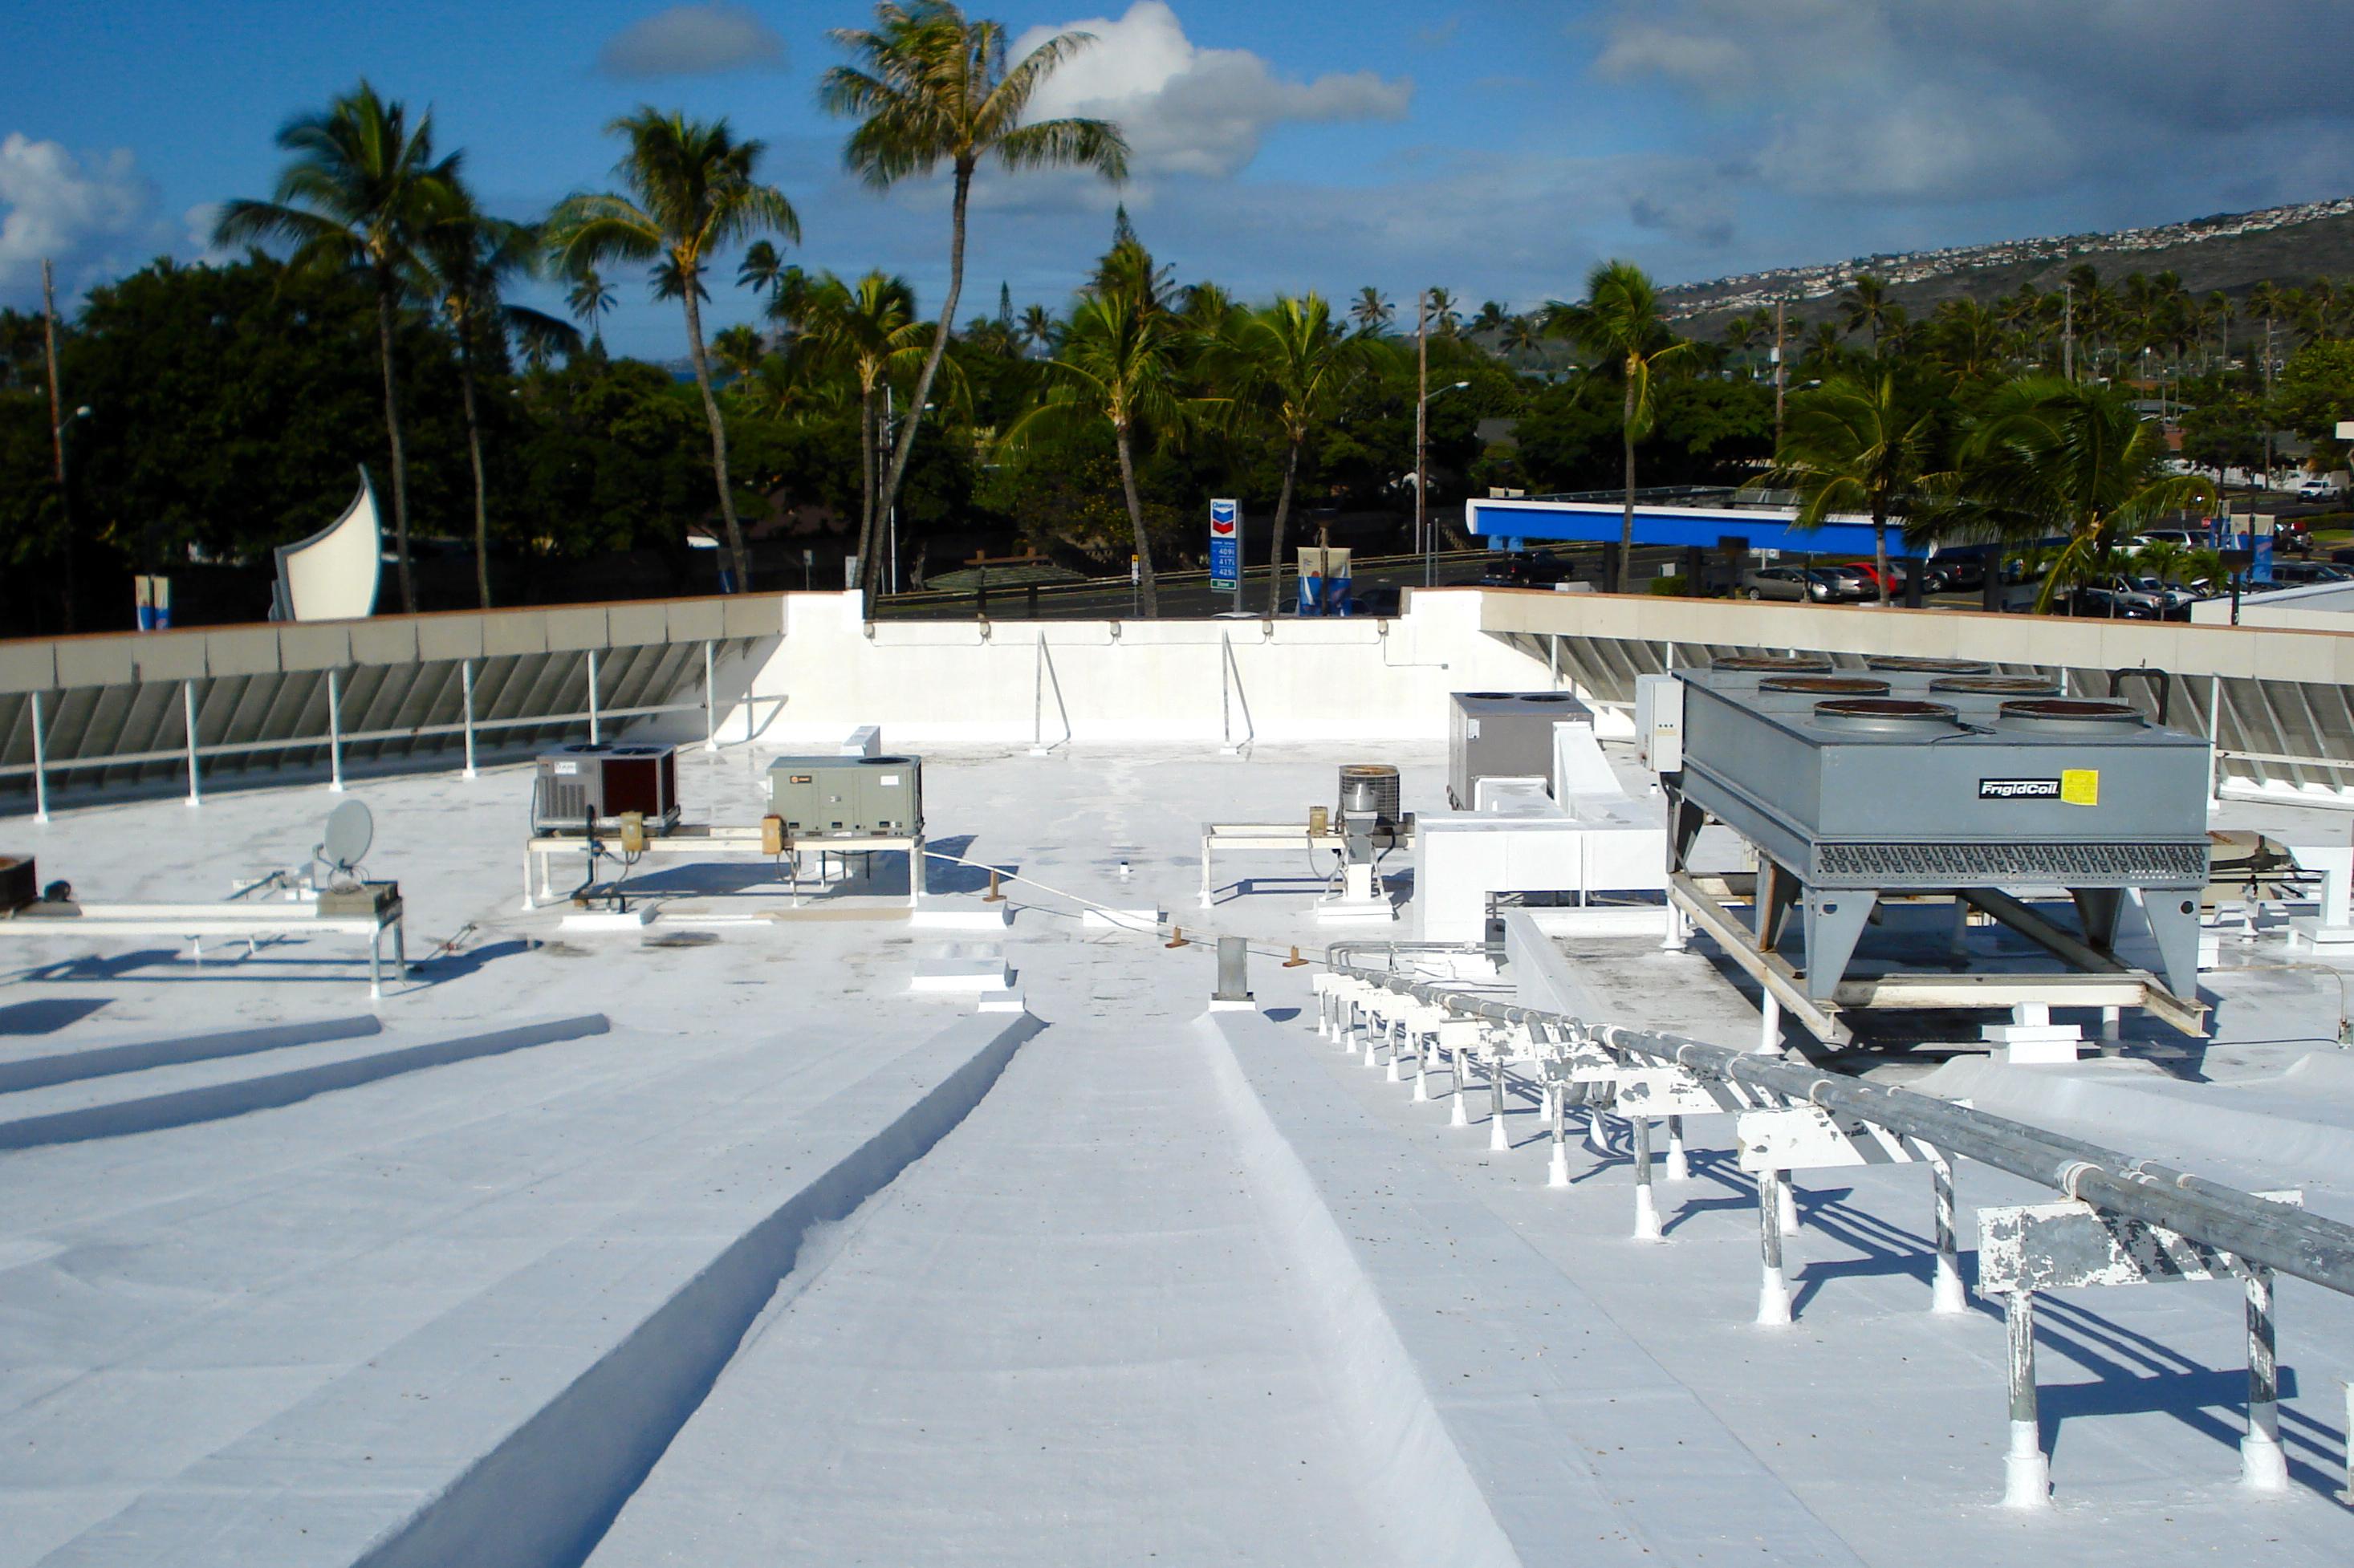 Koko Marina Roof - After